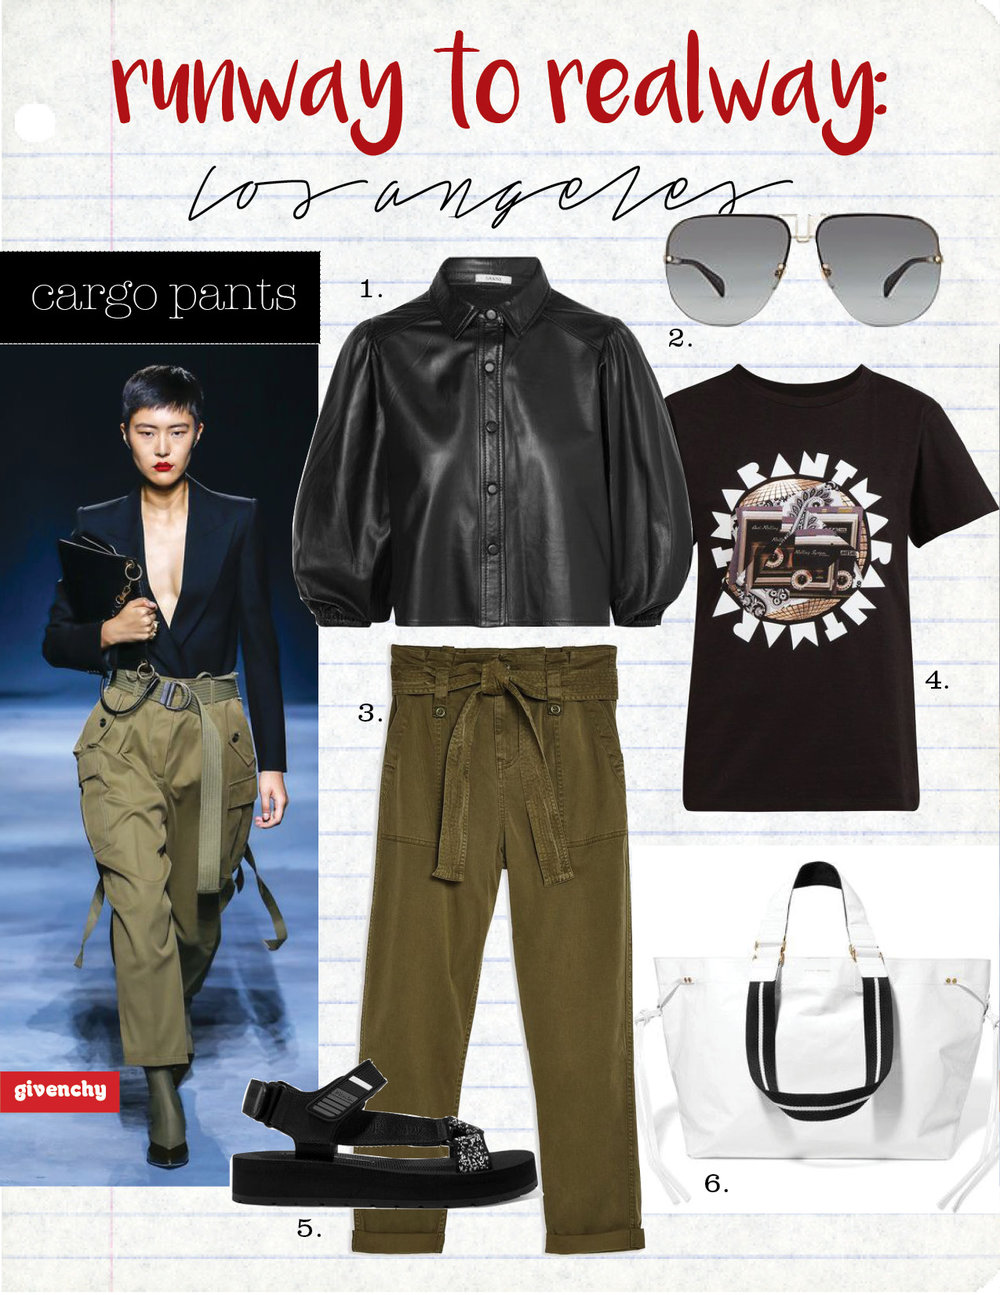 1. ganni leather shirt, $475,  saksfifthavenue.com  2. givenchy sunglasses, $410,  barneys.com  3. topshop cargo trousers, $75,  topshop.com  4. Isabel Marant zaof cotton-jersey t-shirt, $130,  matchesfashion.com  5. prada rubber-trimmed leather and canvas sandal, $590,  net-a-porter.com  6. Isabel Marant wardy tote, $870,  net-a-porter.com